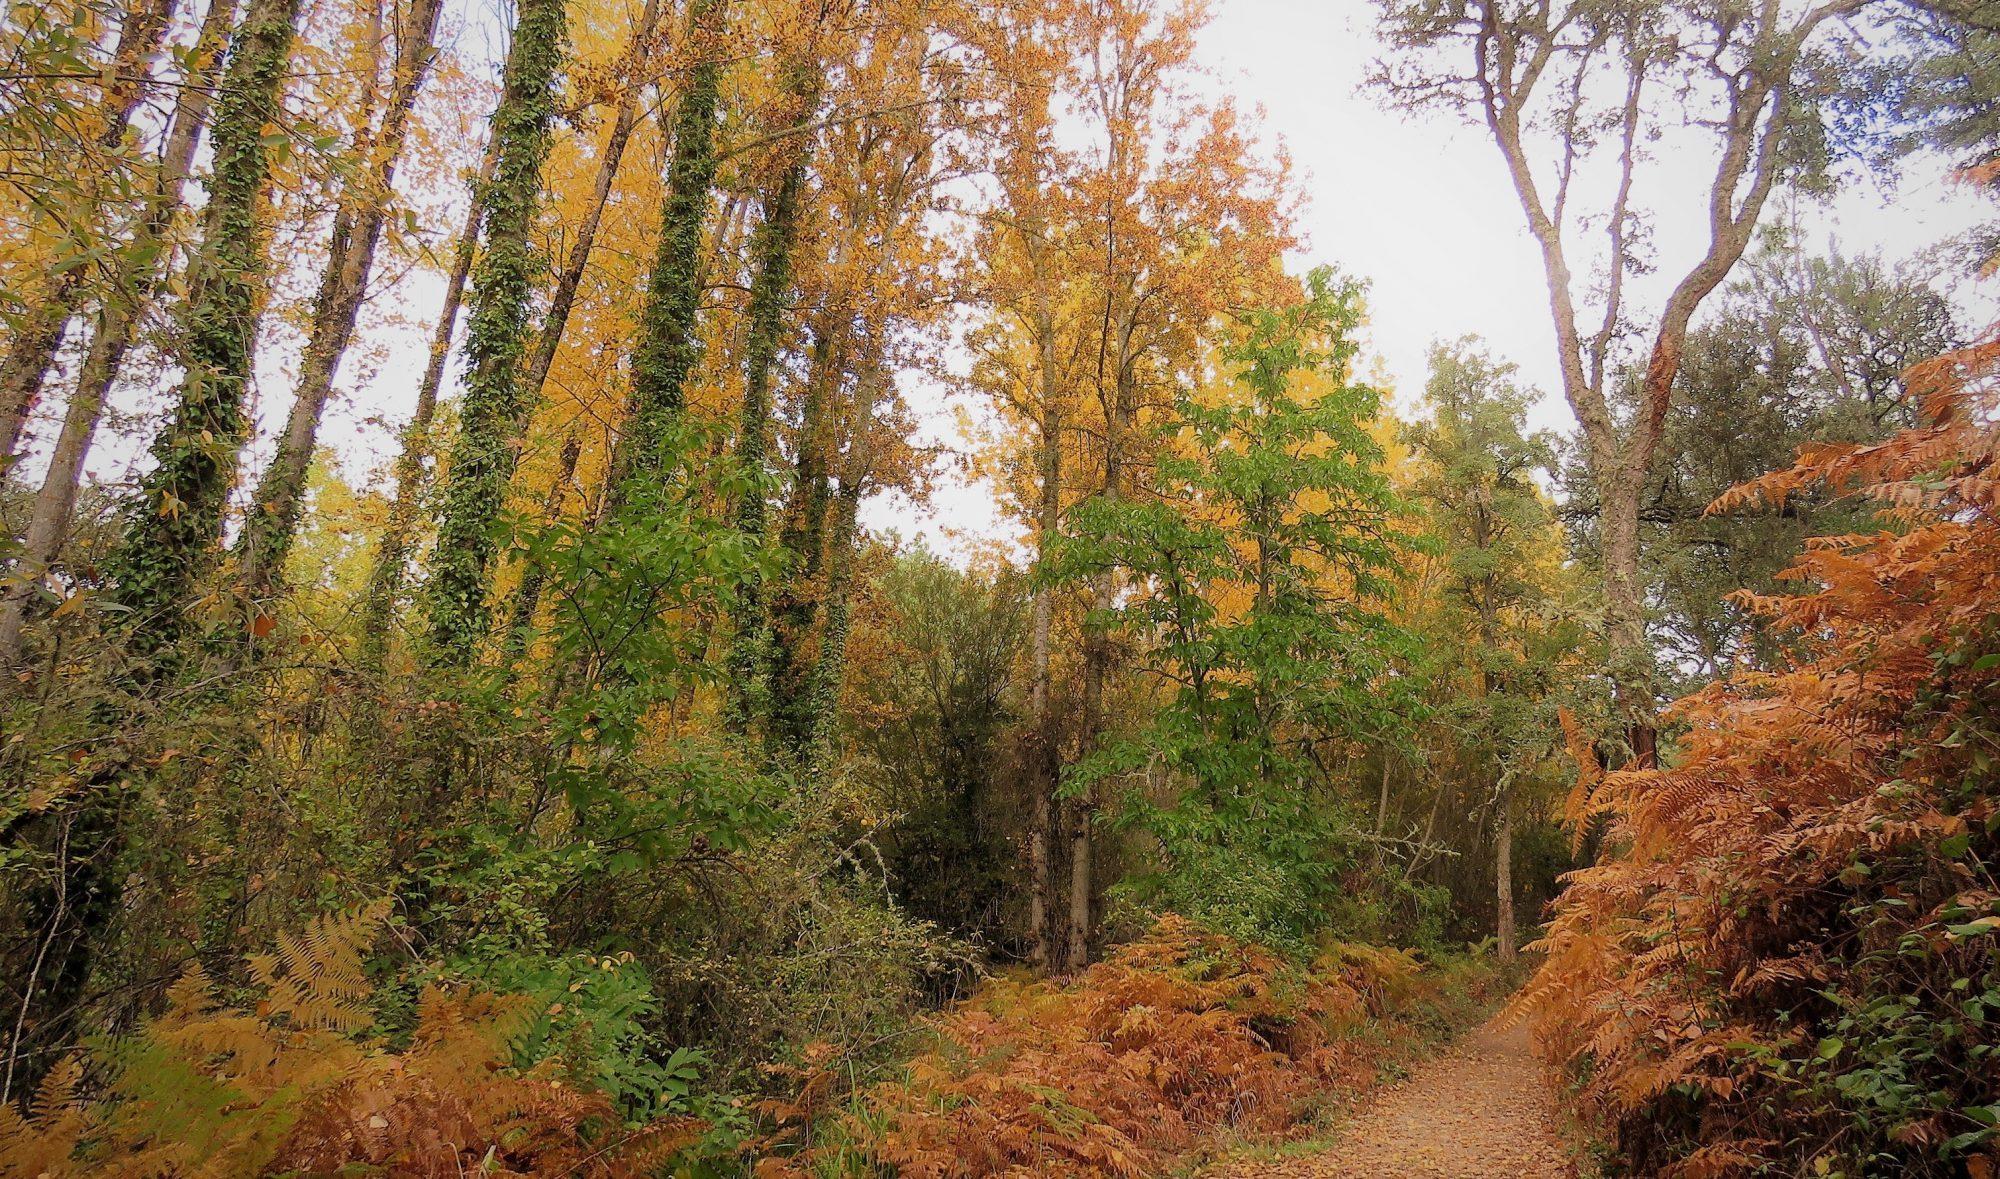 Sierra de Aracena Natural Park